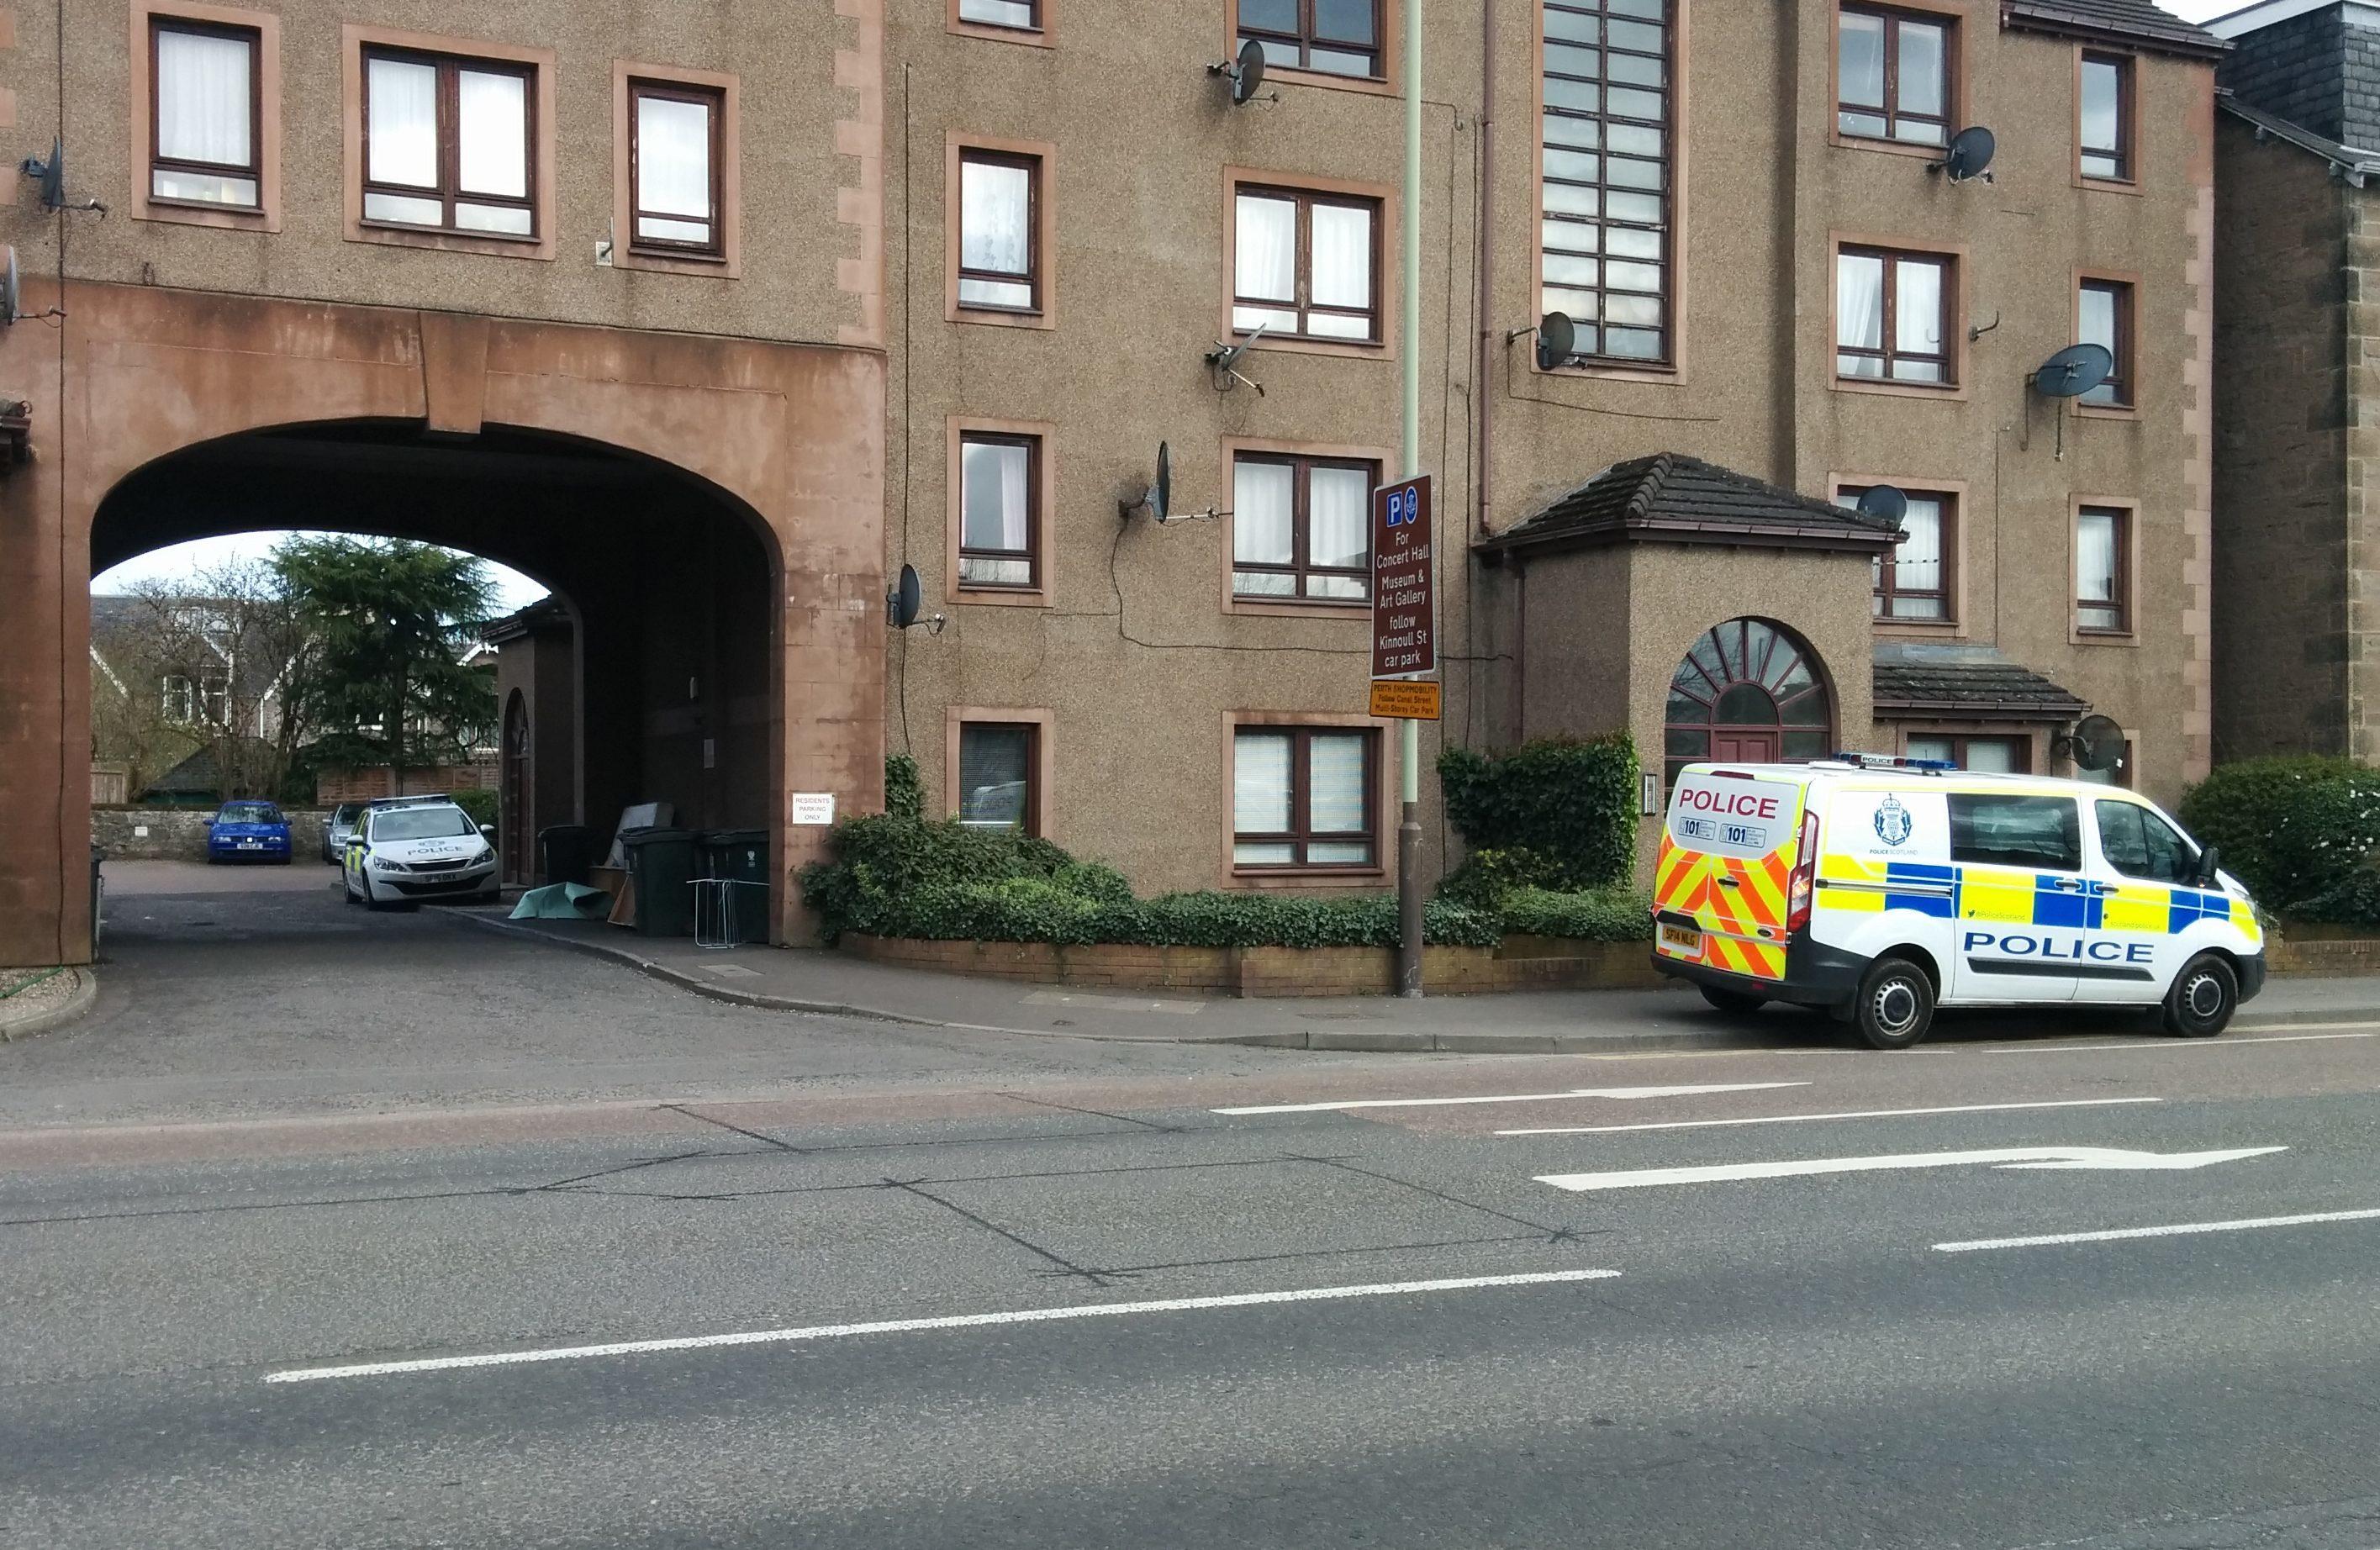 Police at 25 to 29 Dunkeld Road, Perth.